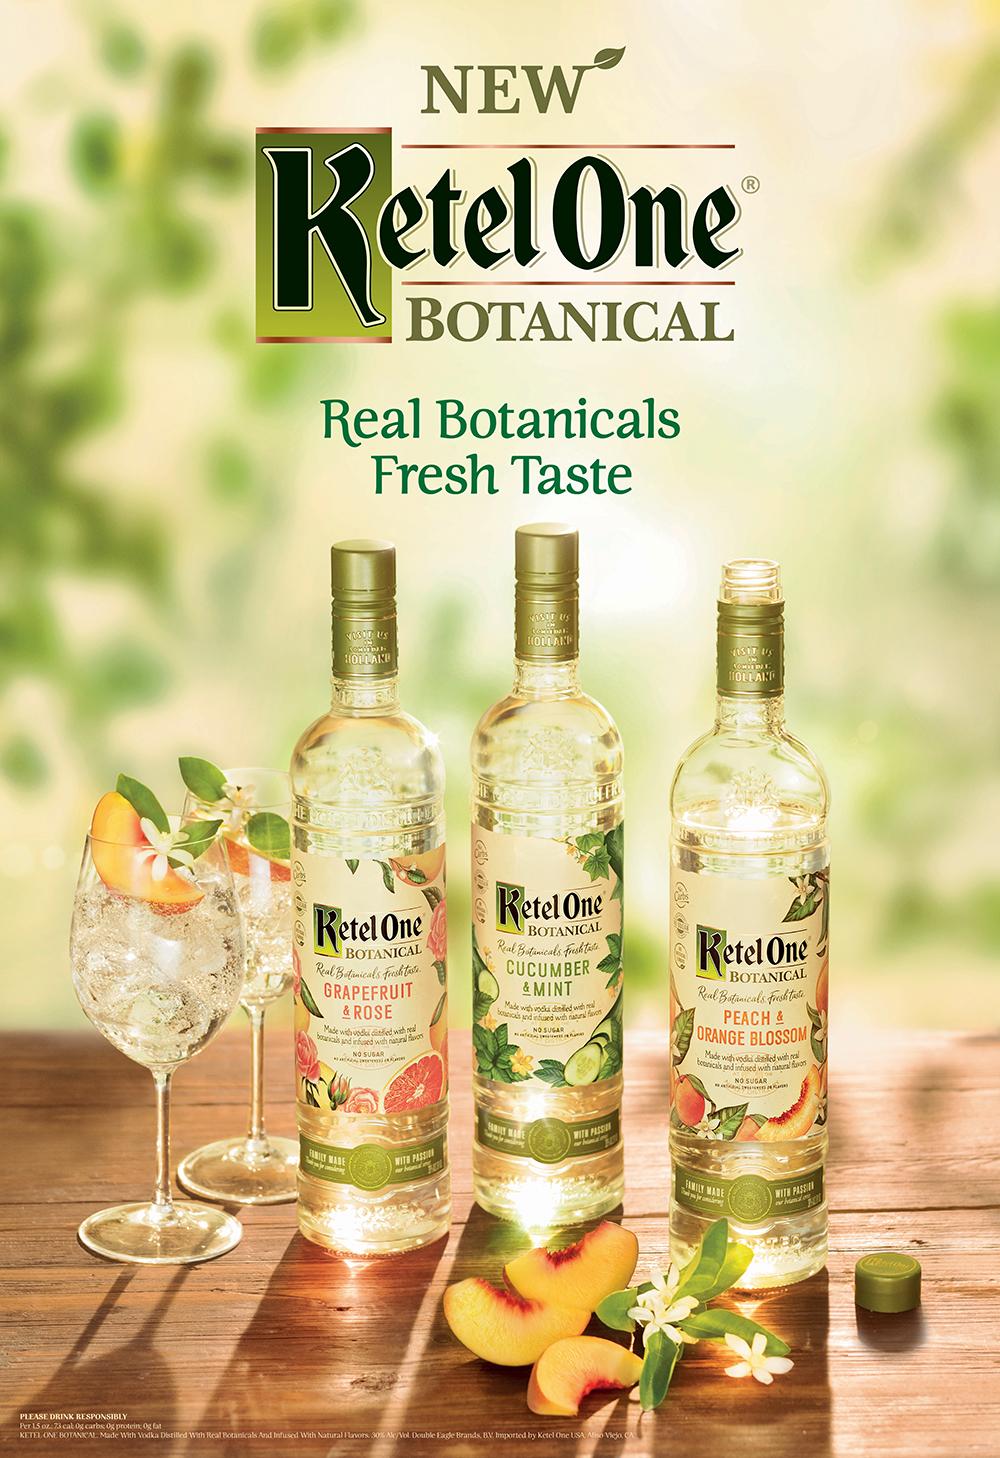 Ketal One Botanical Creative - Varietals